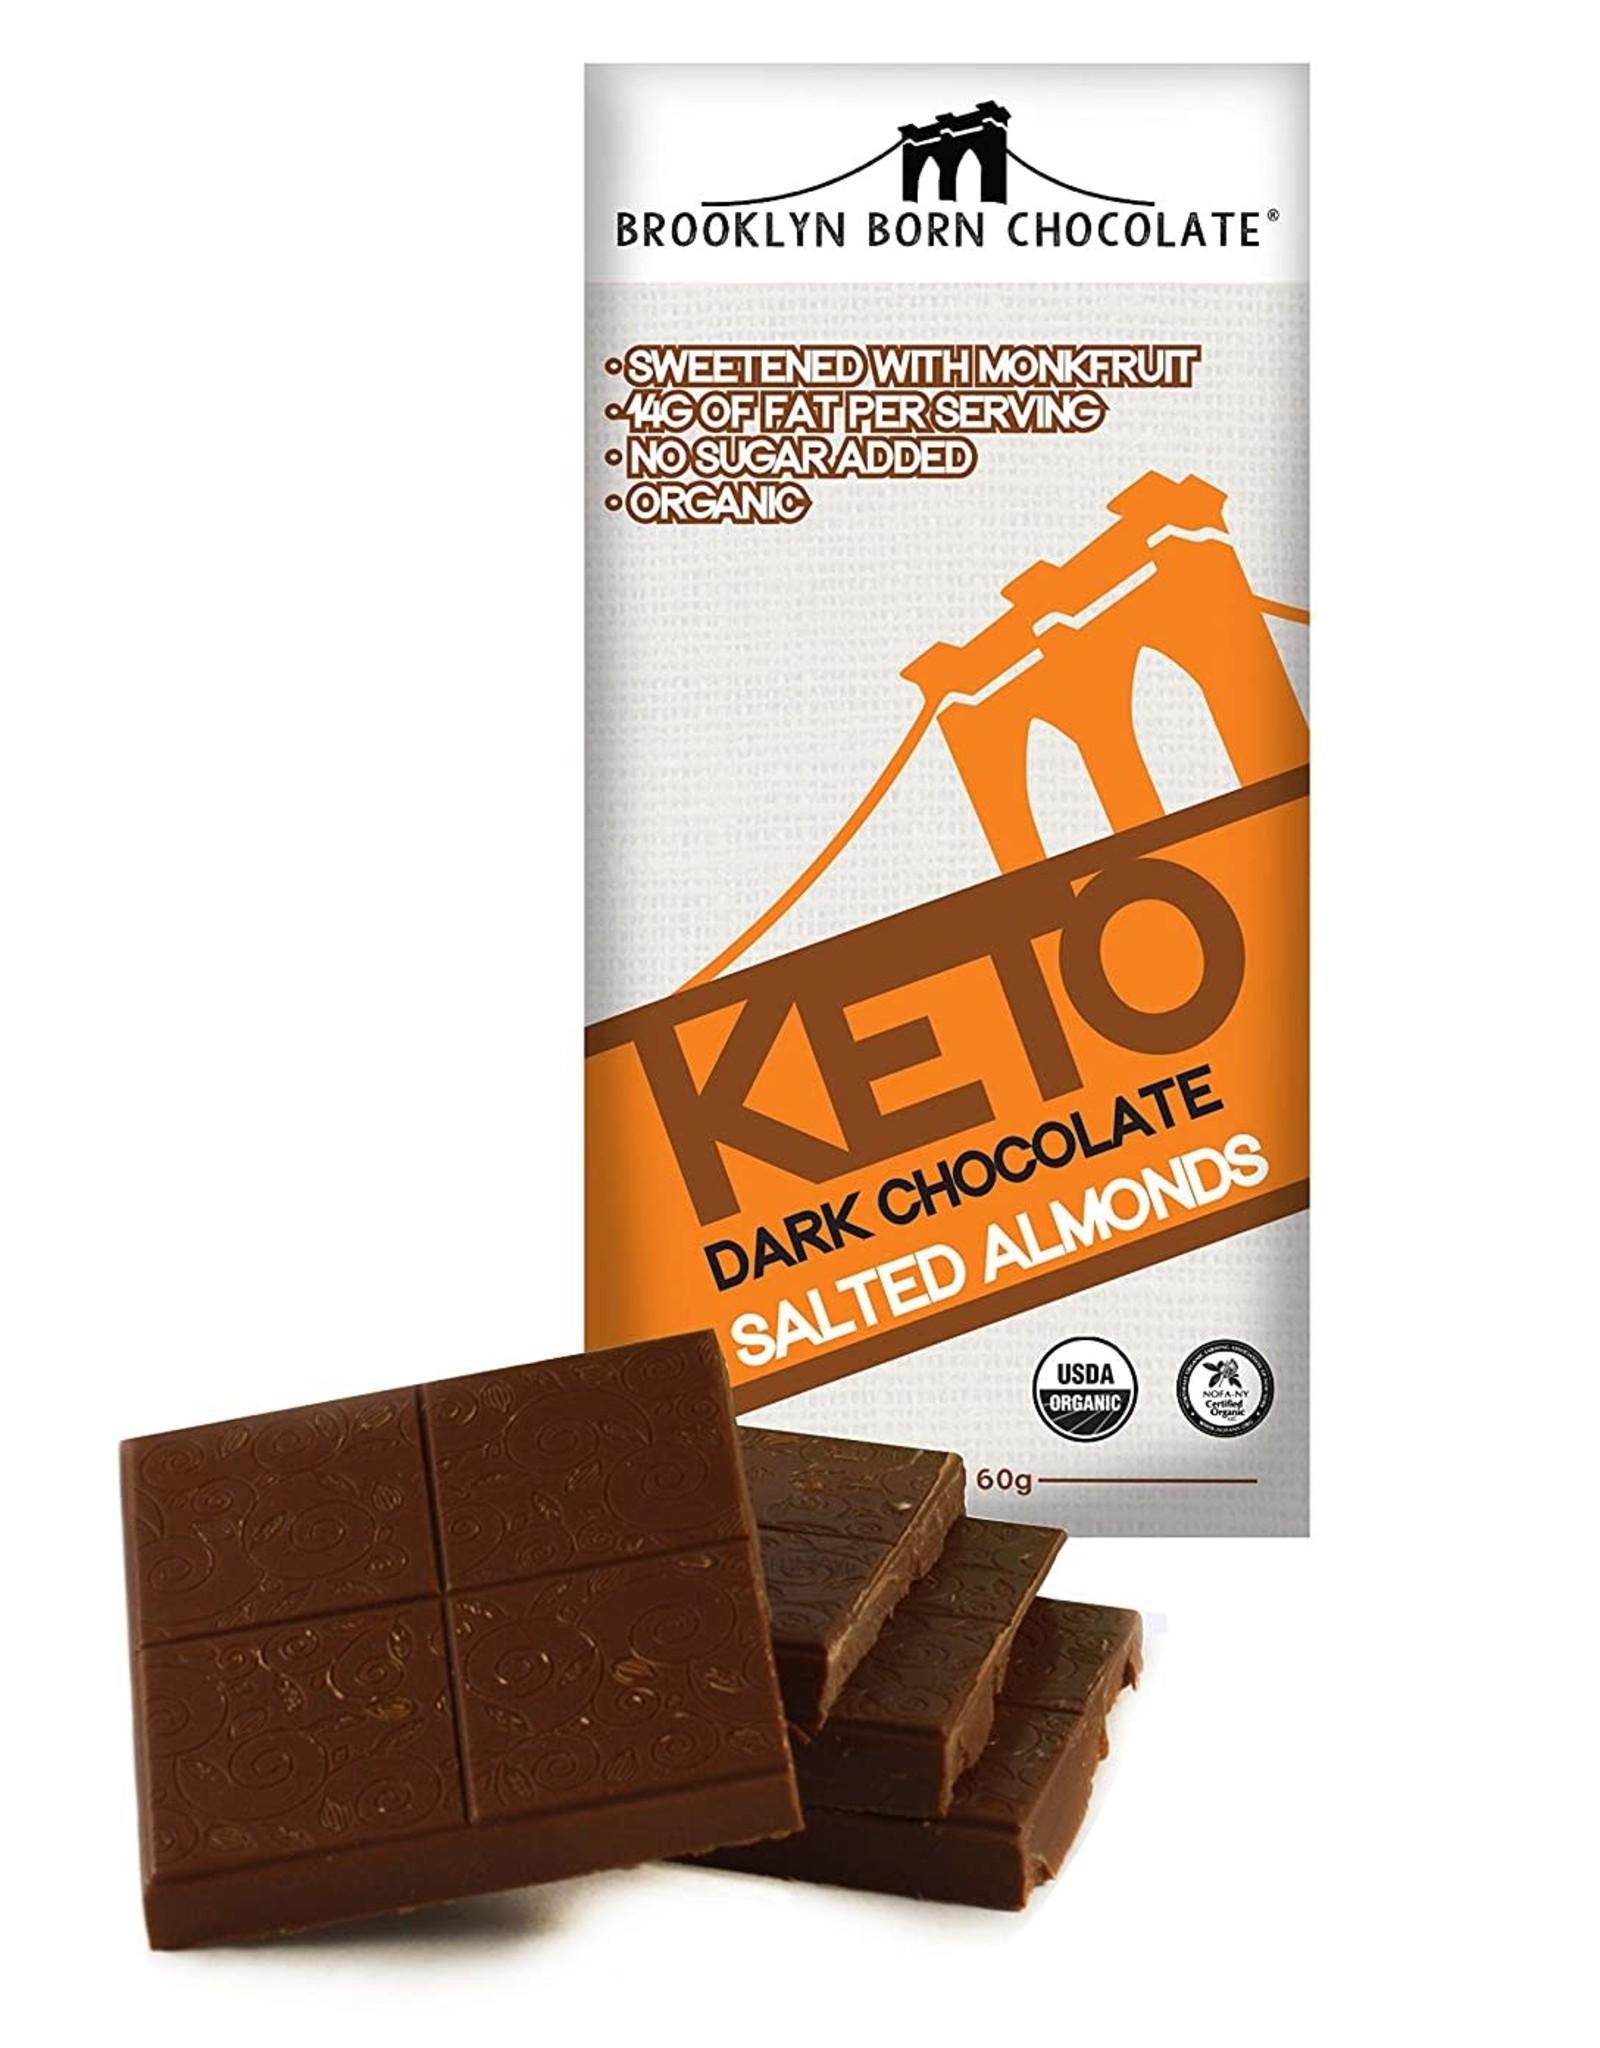 Brooklyn Born Chocolate Brooklyn - Keto Chocolate Bar, Salted Almond (60g)